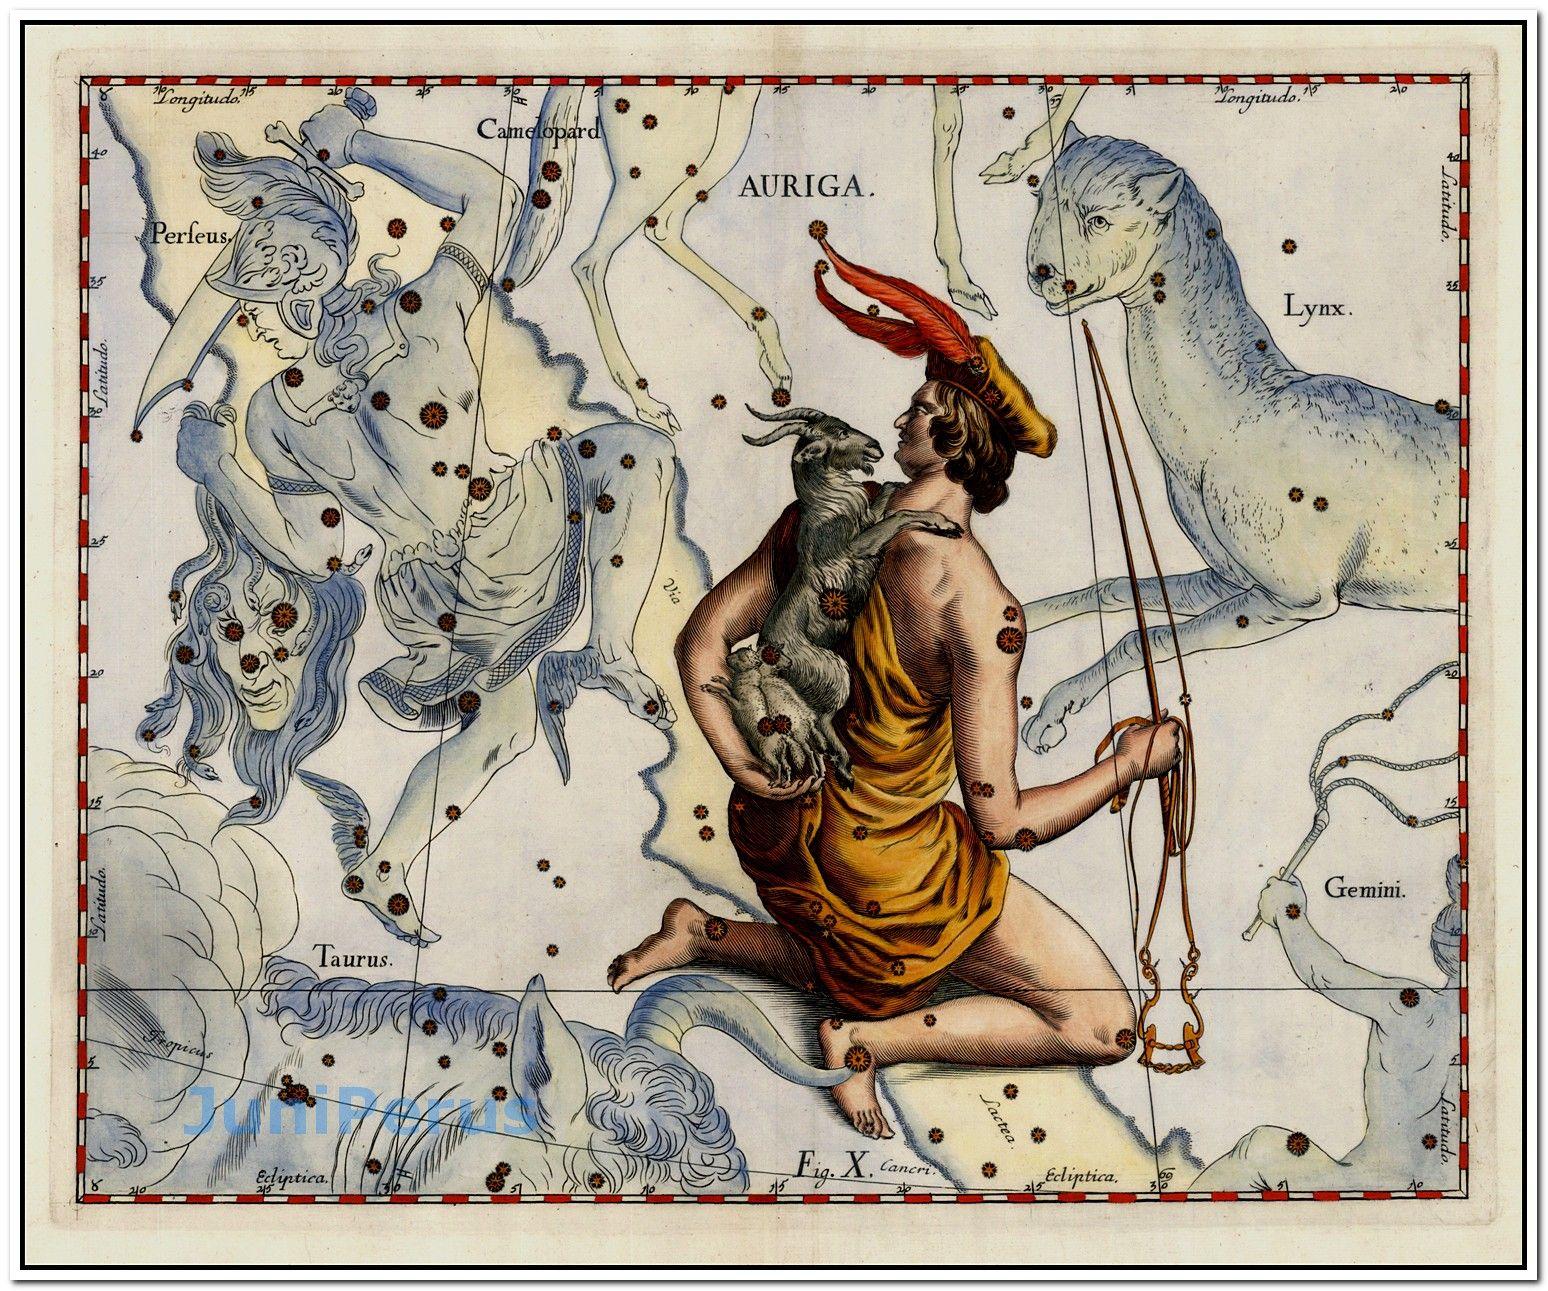 Auriga Stars Heightened In Gold Map Maker Johannes Hevelius Place - Star map maker